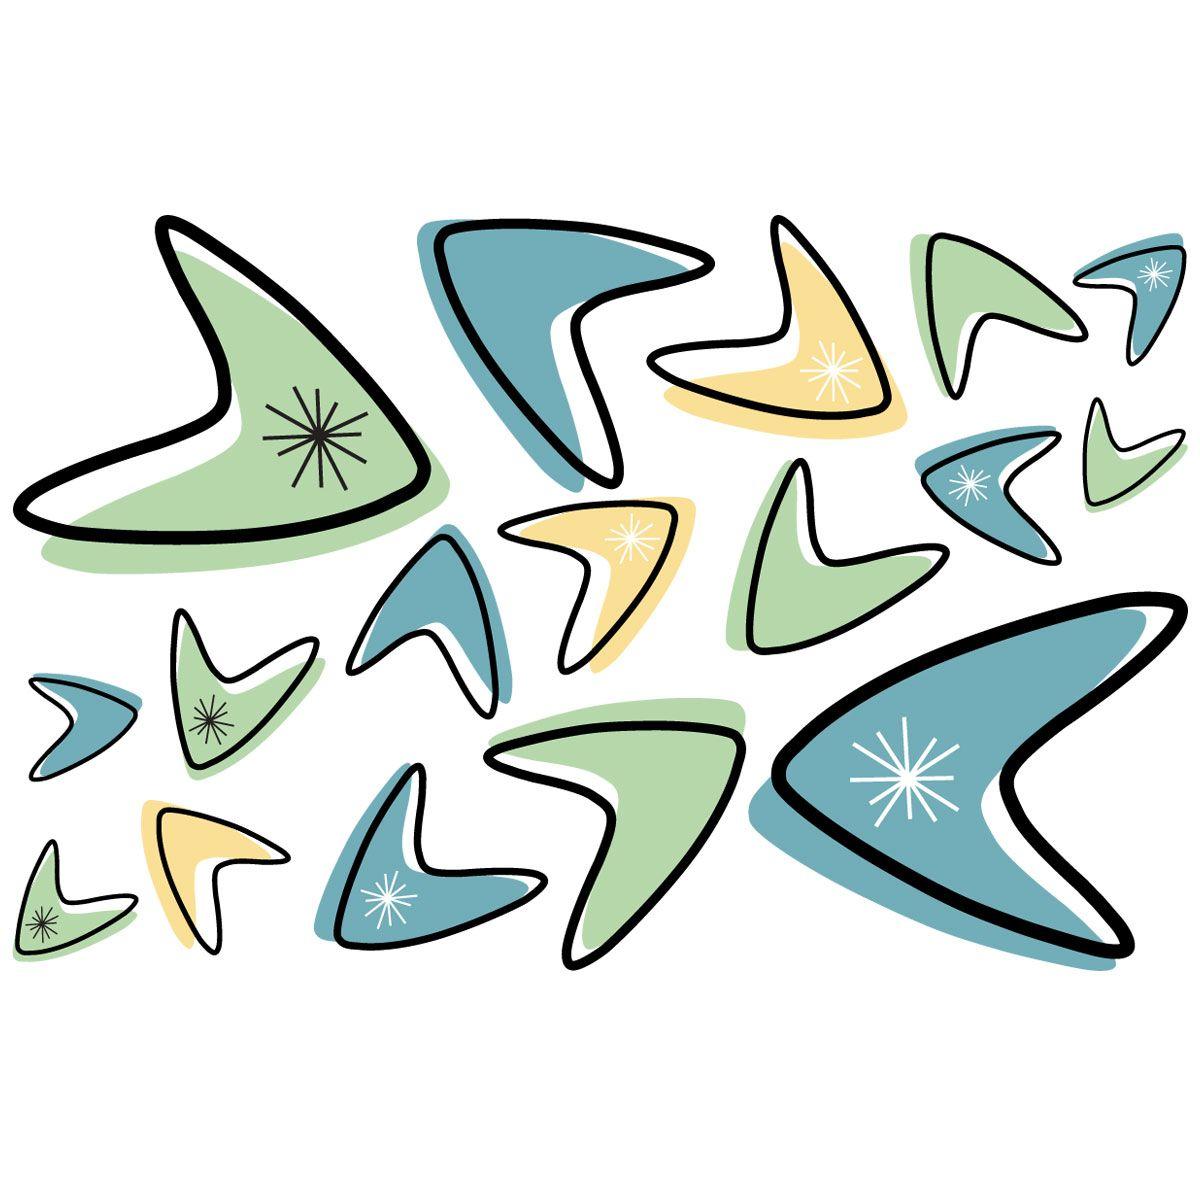 Atomic Boomerangs Vinyl Sticker Sheet Of Vinyl Sticker Sheets - Where to get vinyl stickers made